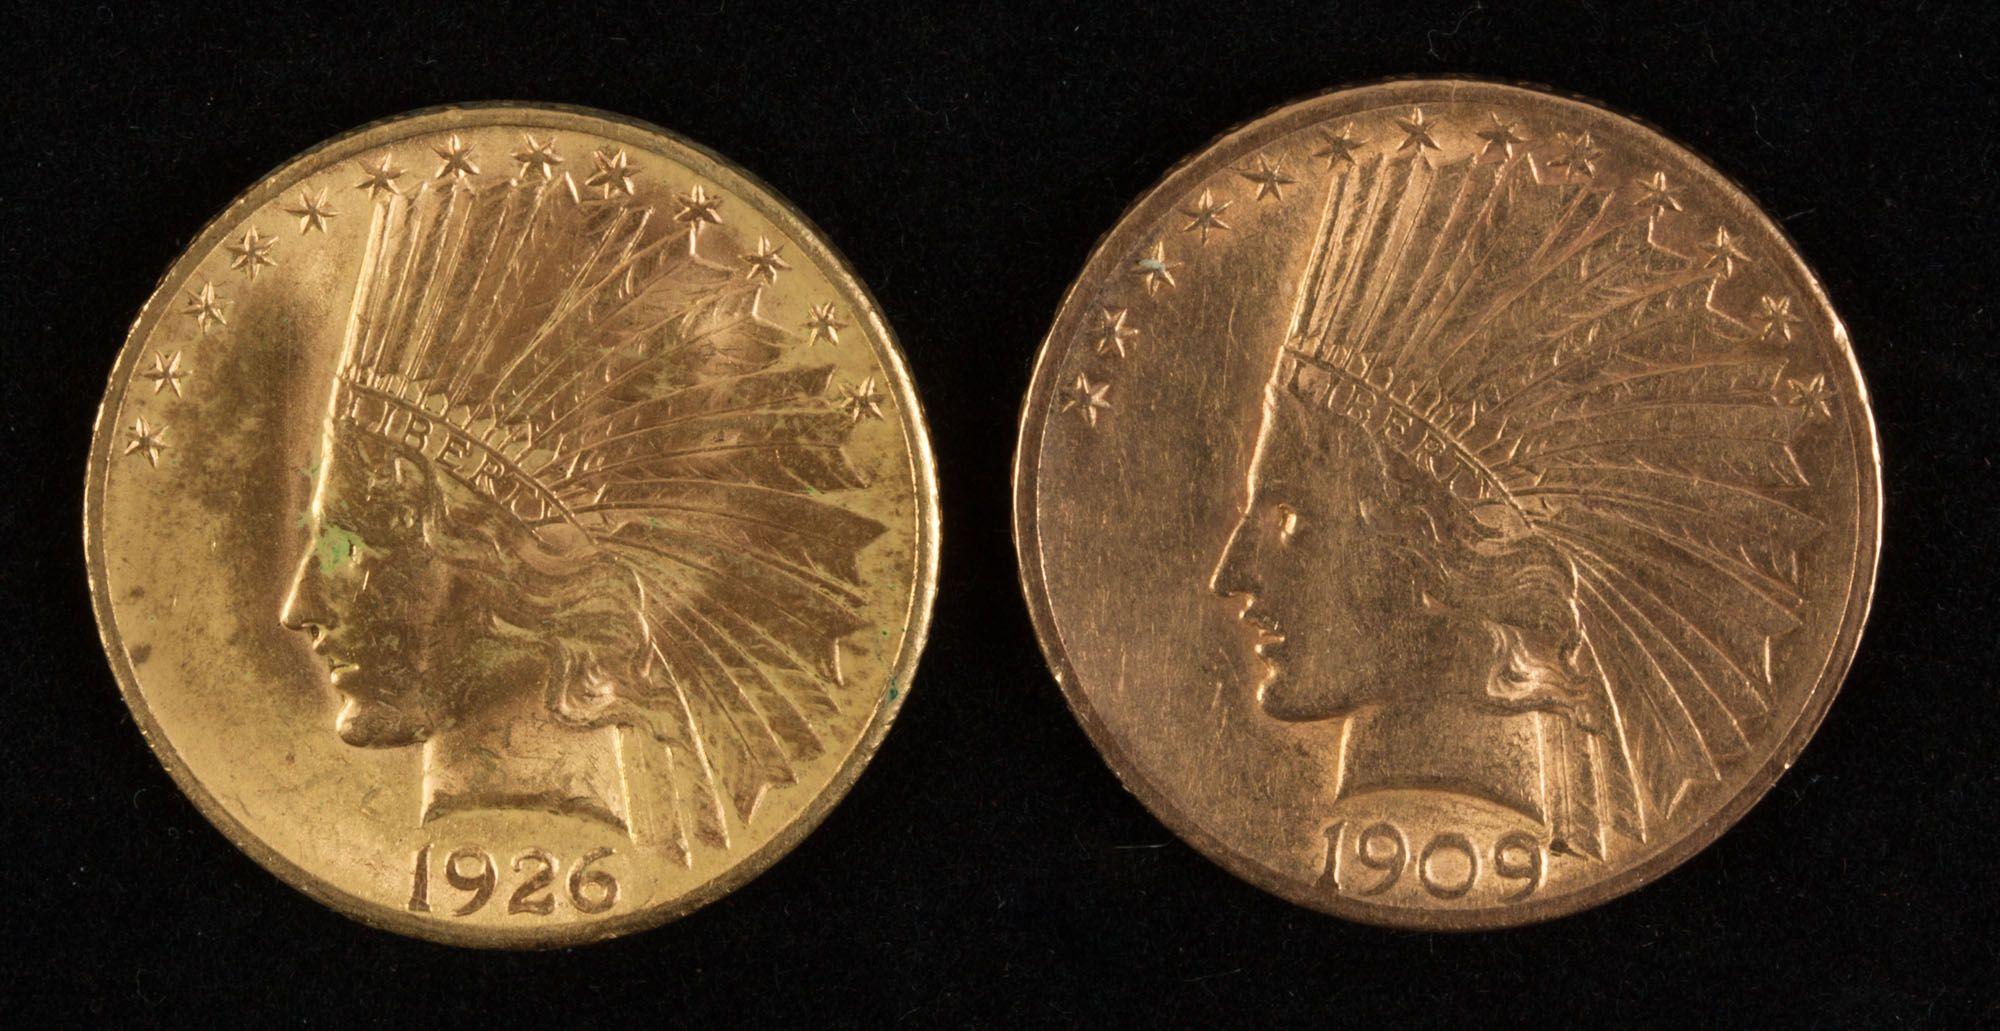 1906 1926 10 Dollar Indian Head Gold Coins Bullion Bullioncoins Coins Coincollecting Preciousmetals Bullioncoin Collect In 2020 Gold Coins Coins Greek Coins